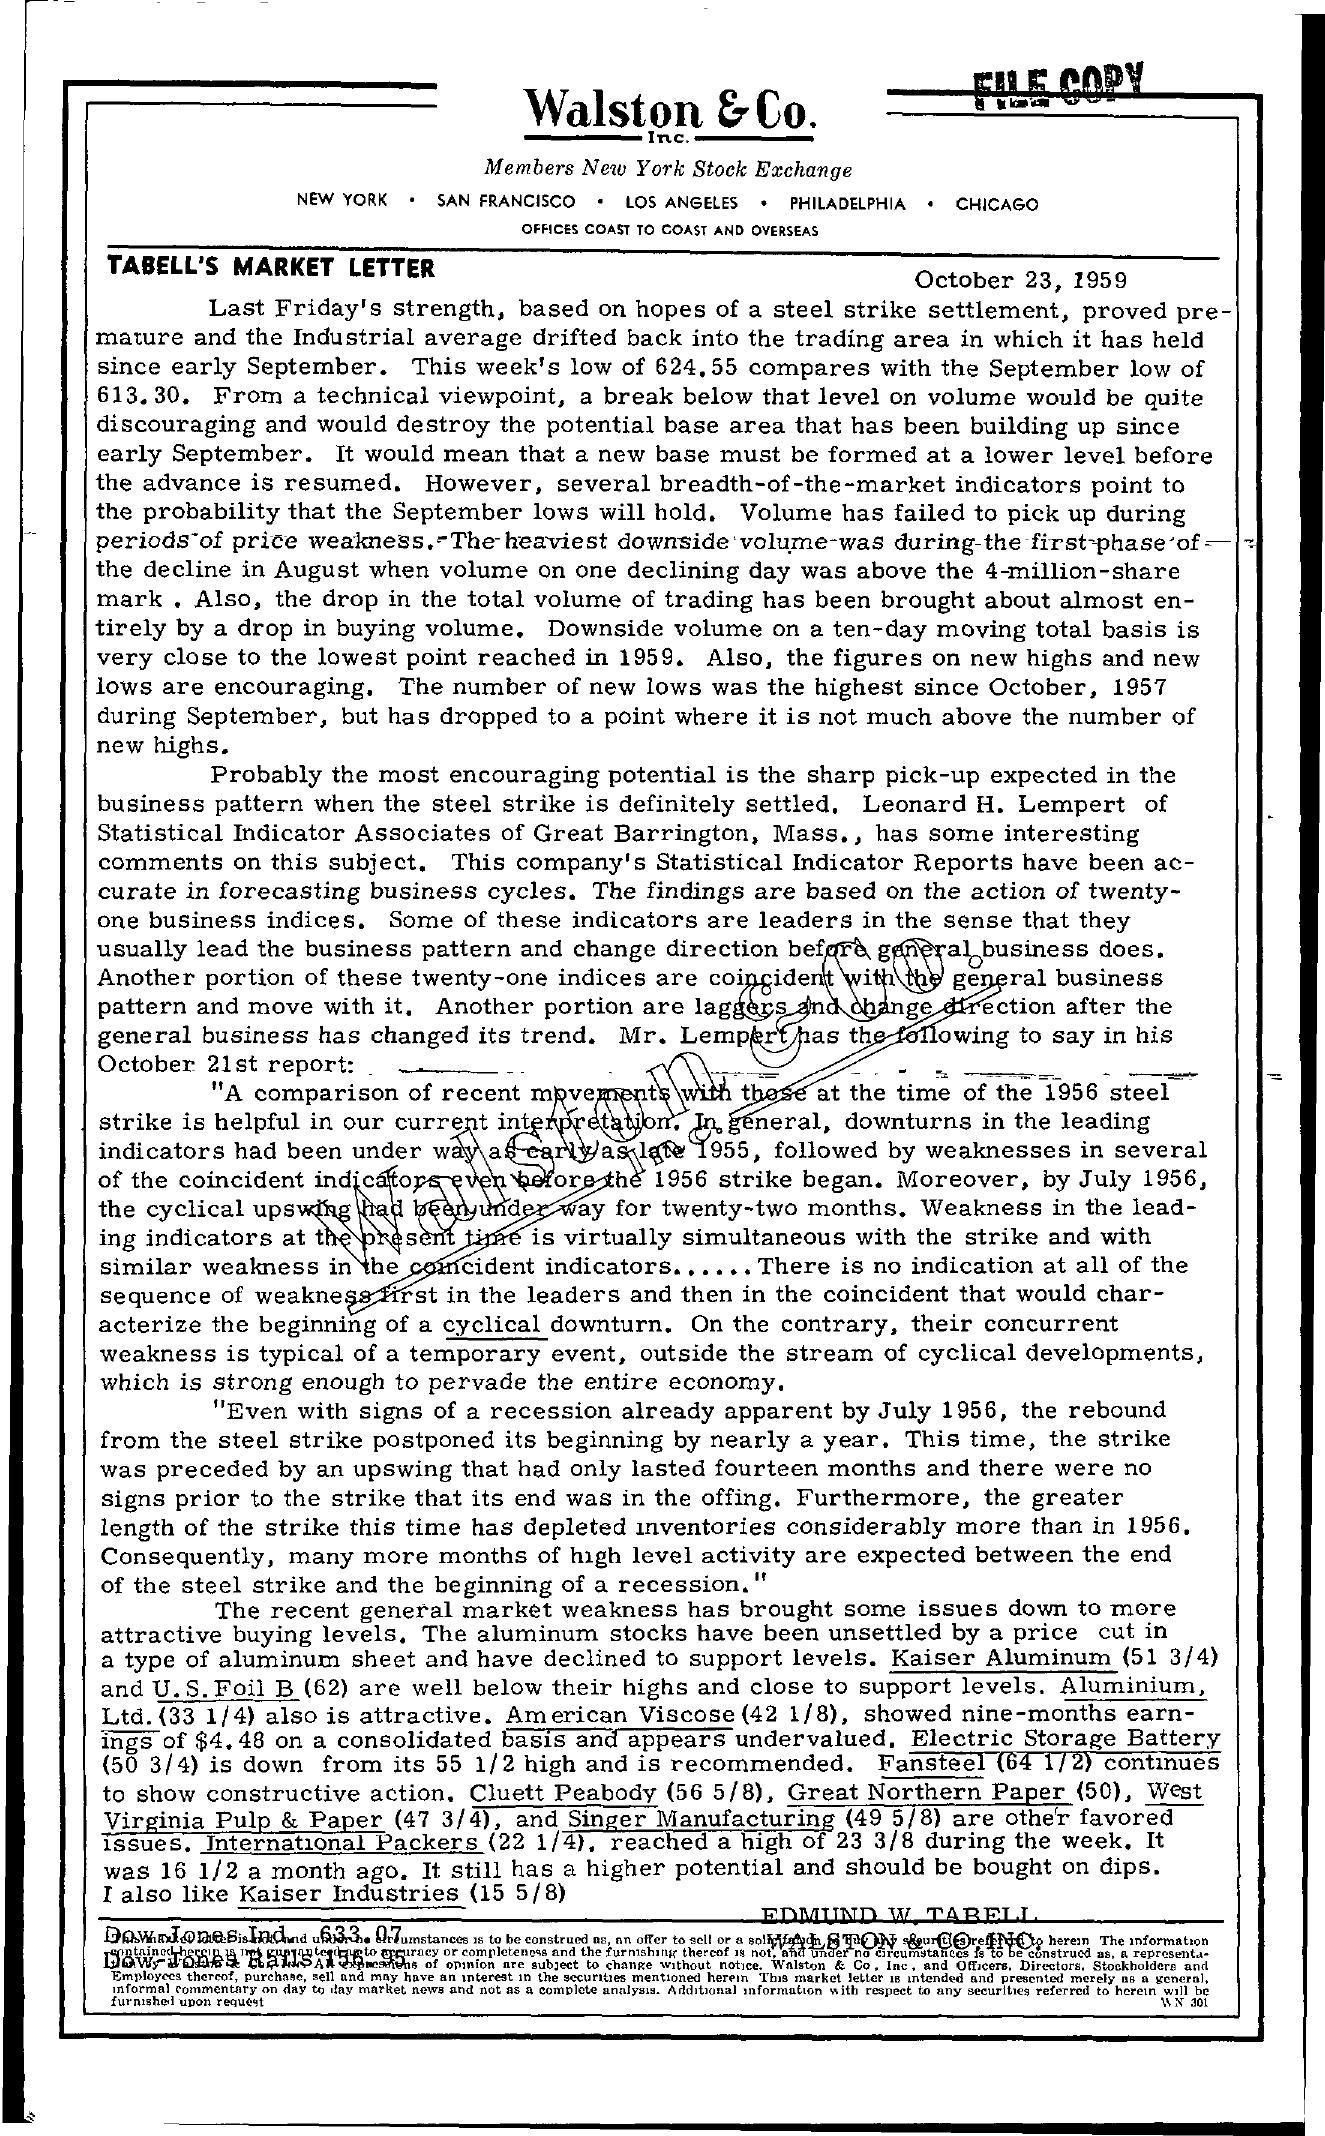 Tabell's Market Letter - October 23, 1959